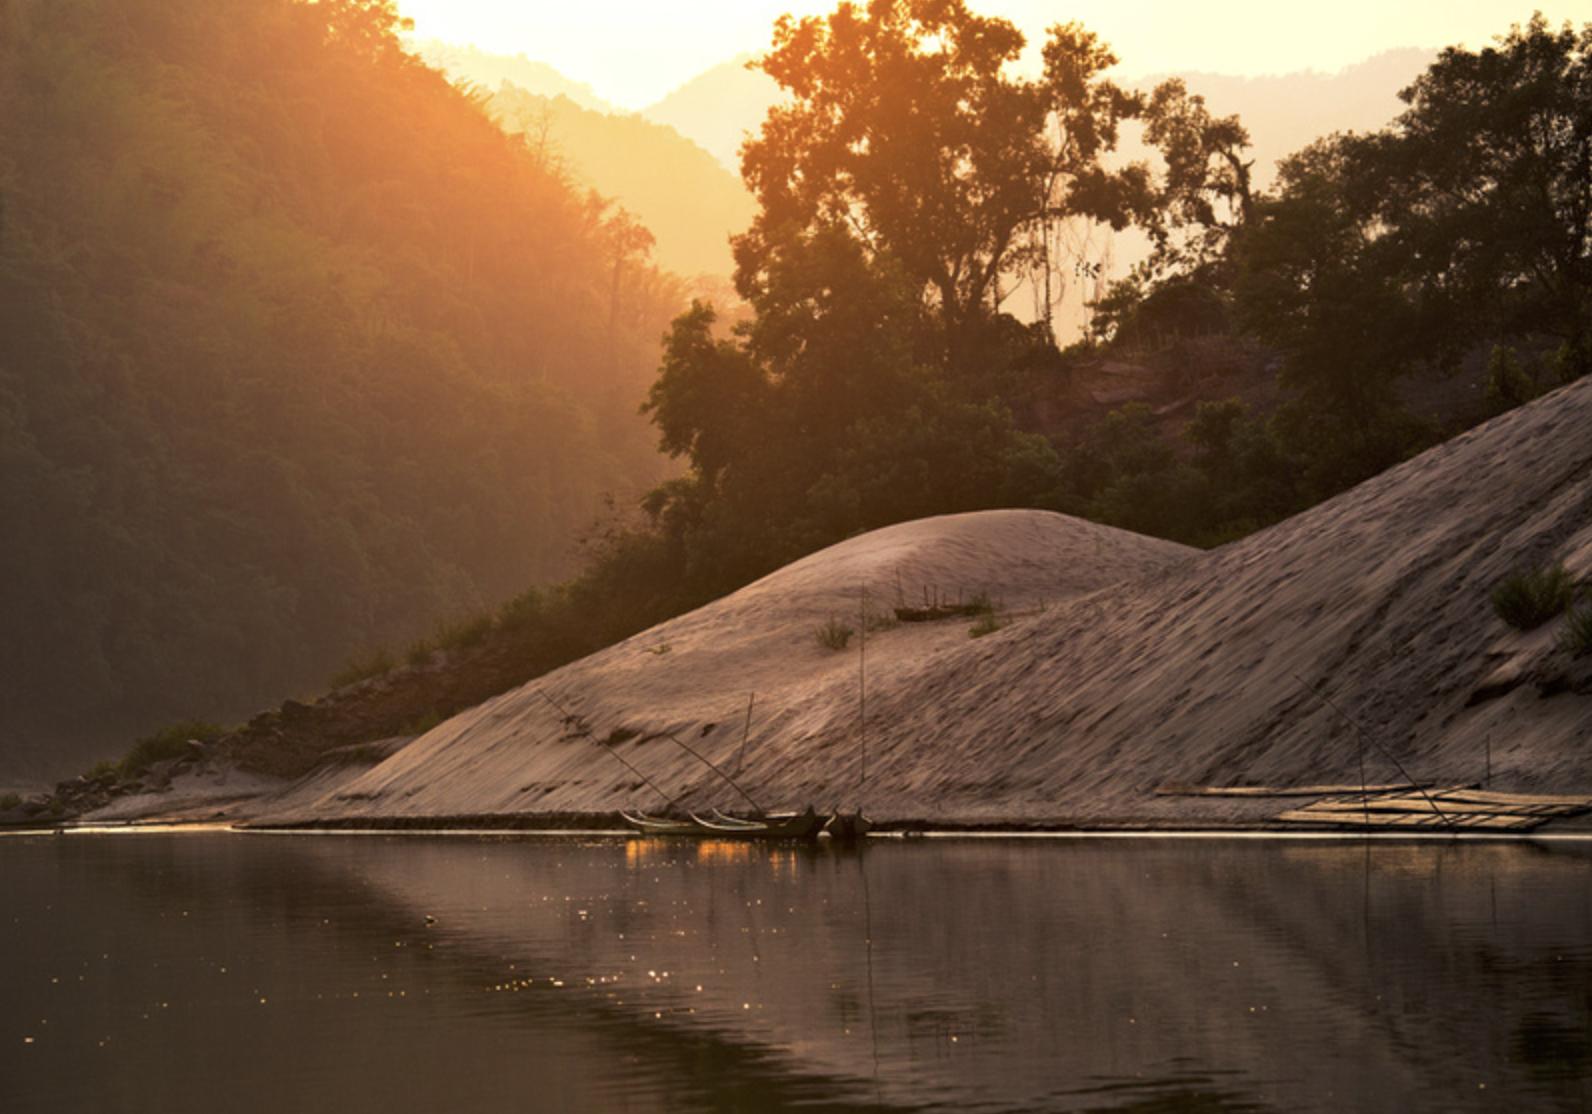 Sunset about 10km from Pak Beng, Laos